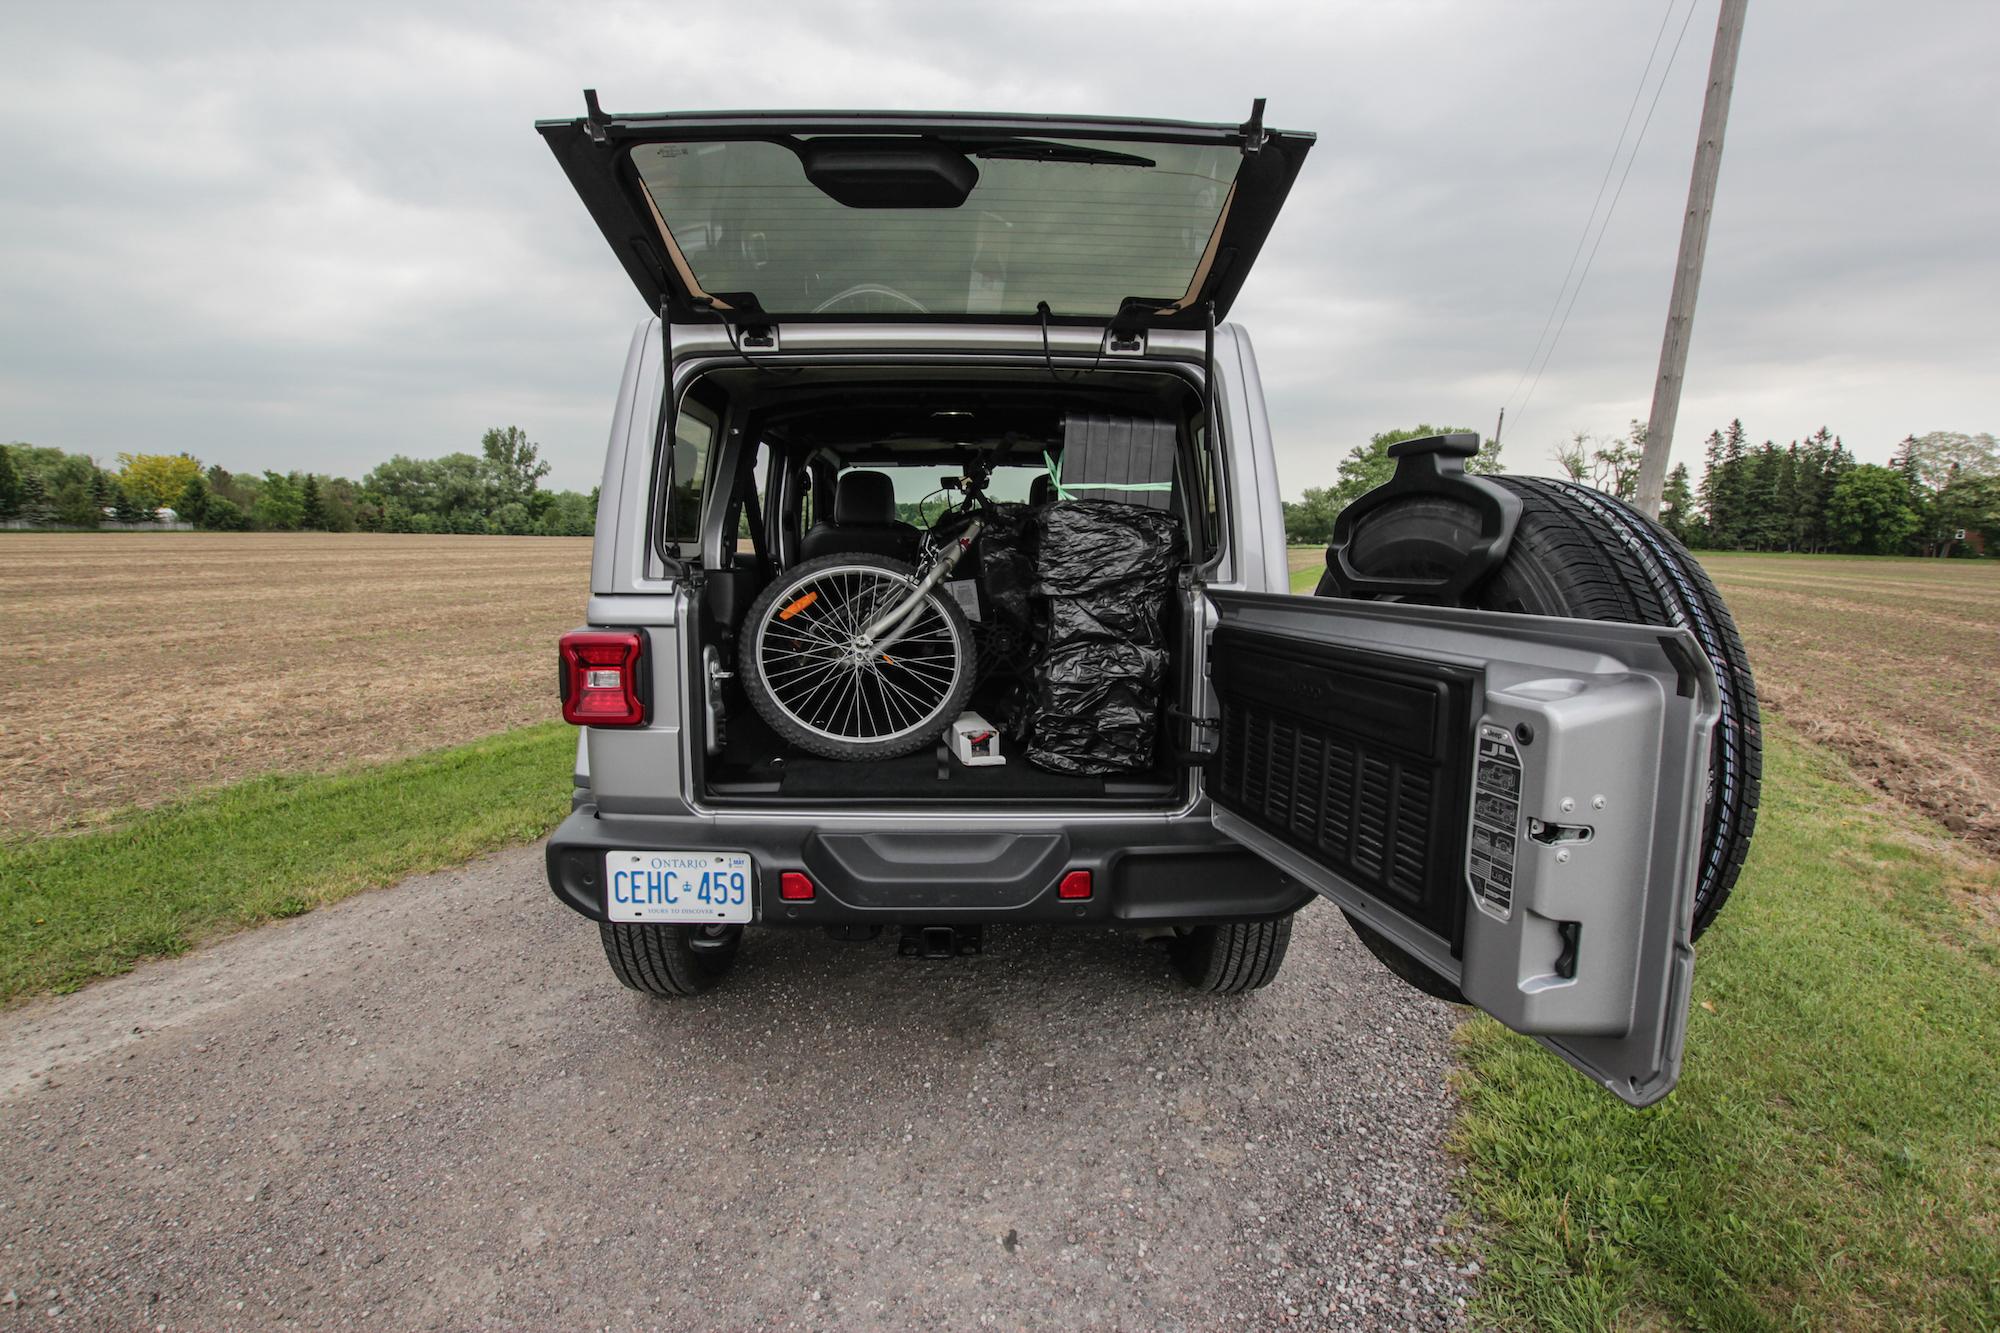 review 2018 jeep wrangler sahara unlimited car. Black Bedroom Furniture Sets. Home Design Ideas